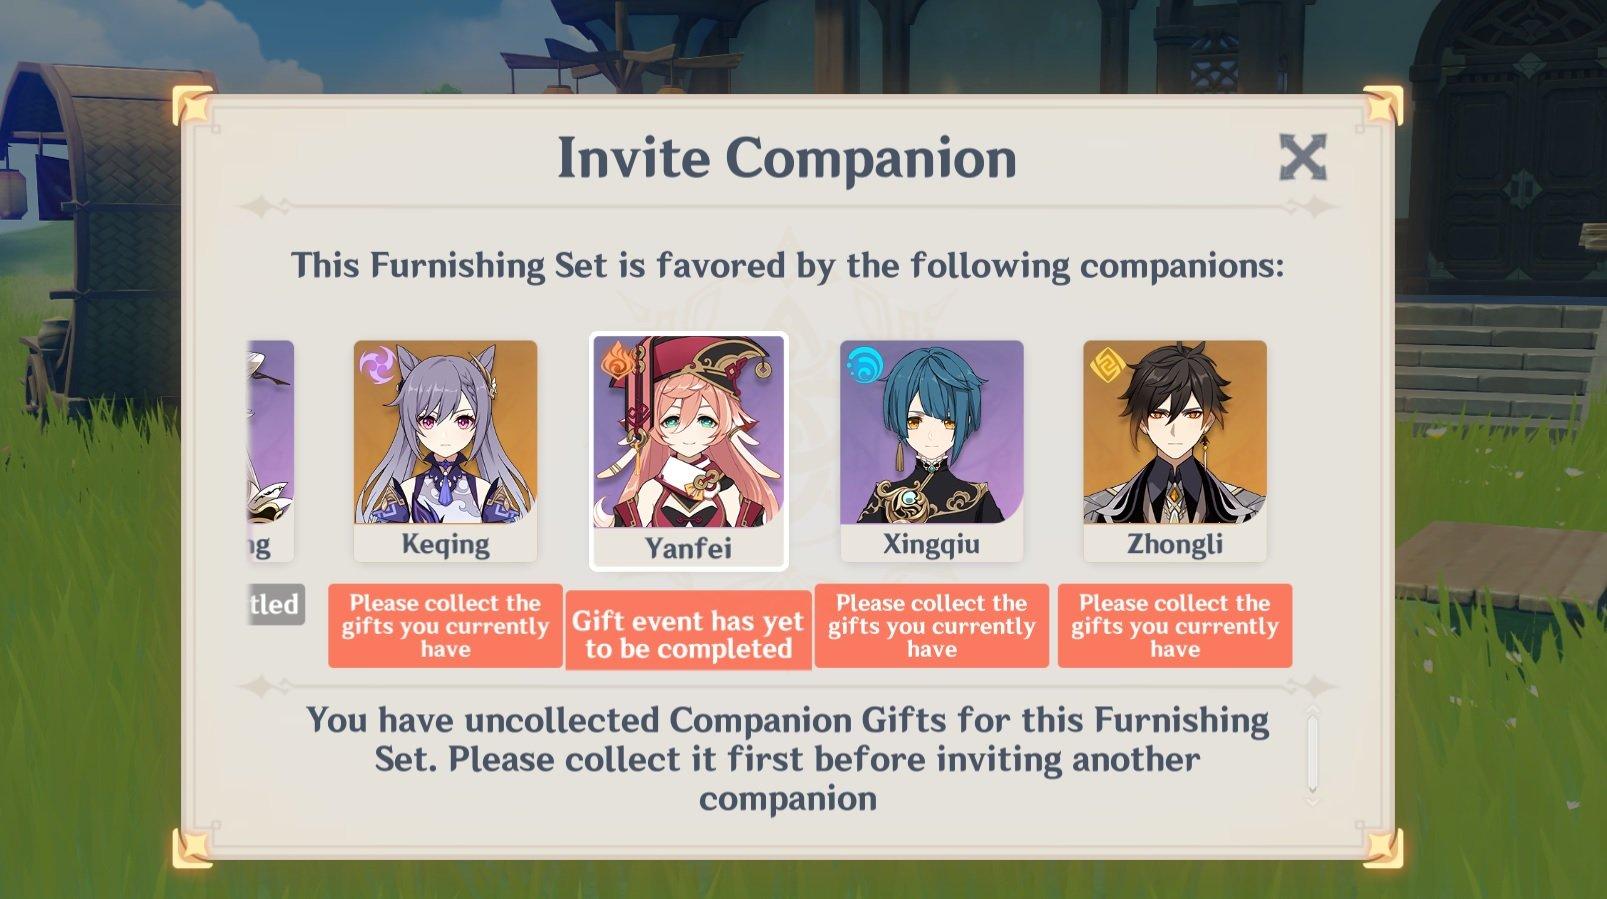 Genshin Impact invite companion gift receiving